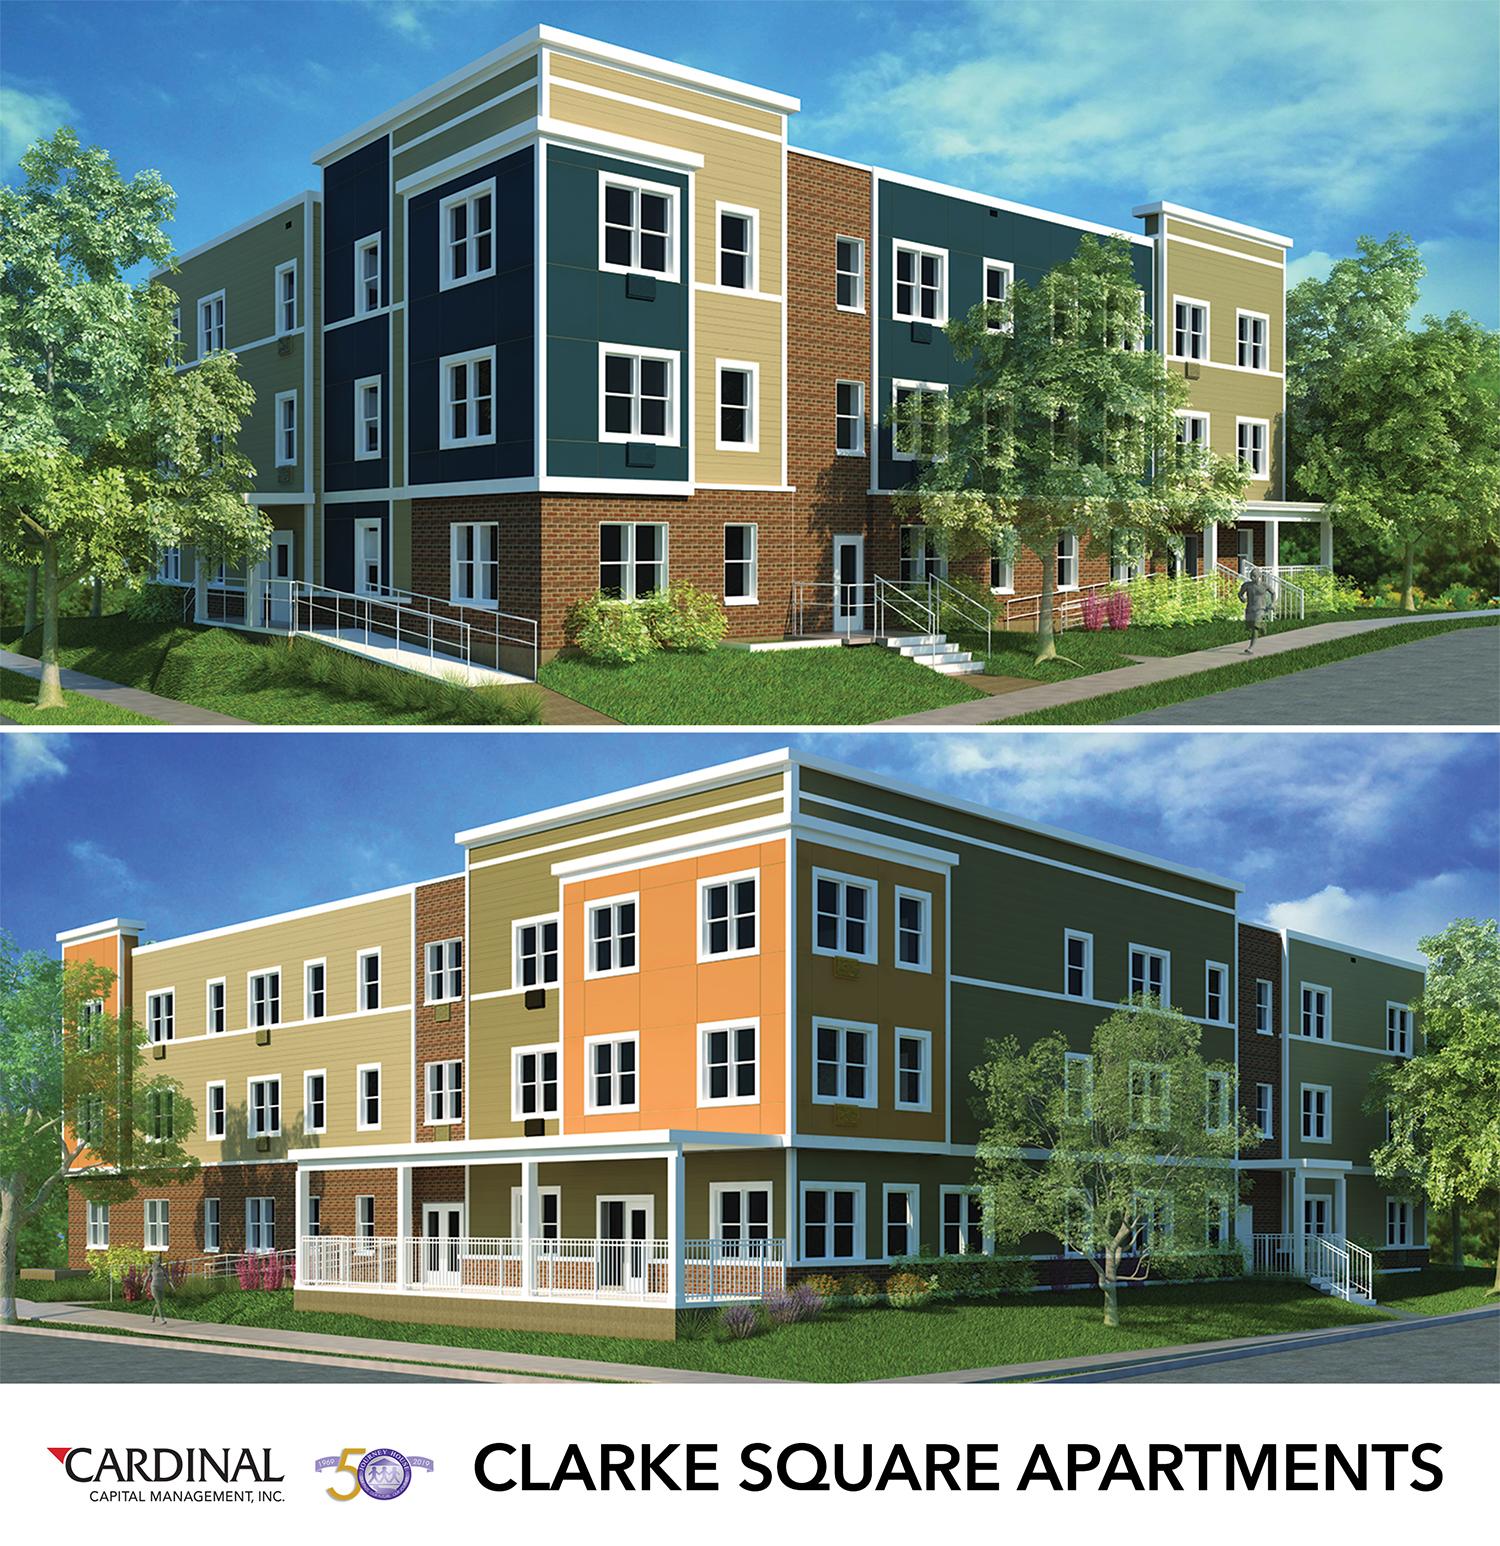 Clarke Square Renderings - Announcement.jpg